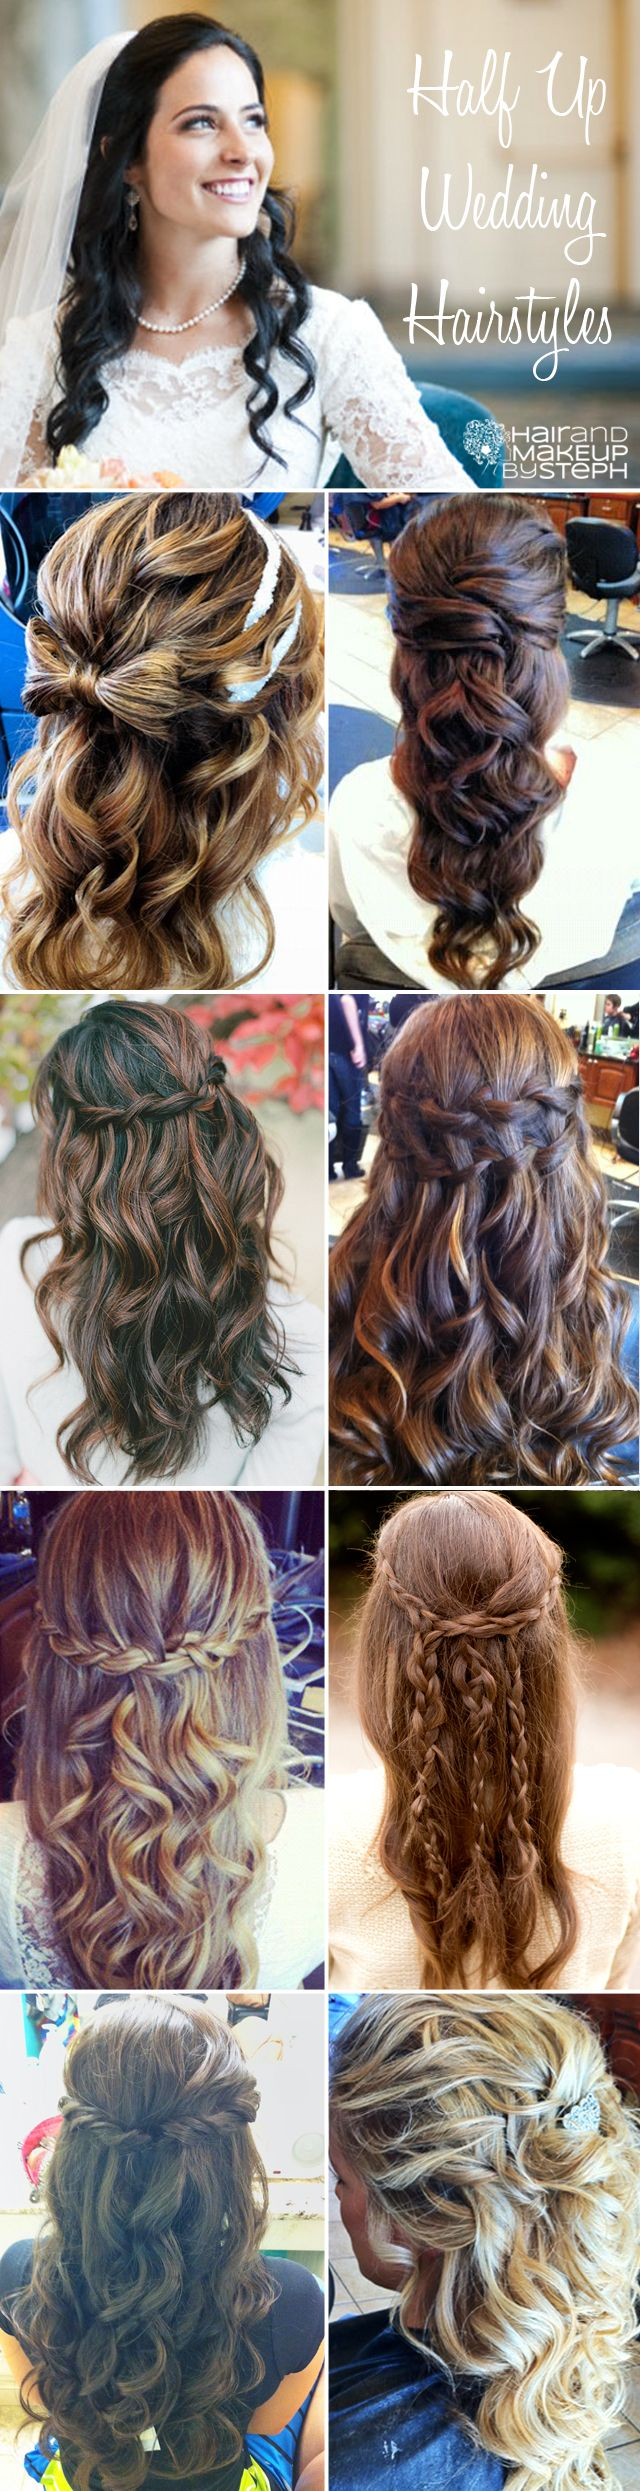 half up wedding hairstyles via blog.hairandmakeupbysteph.com